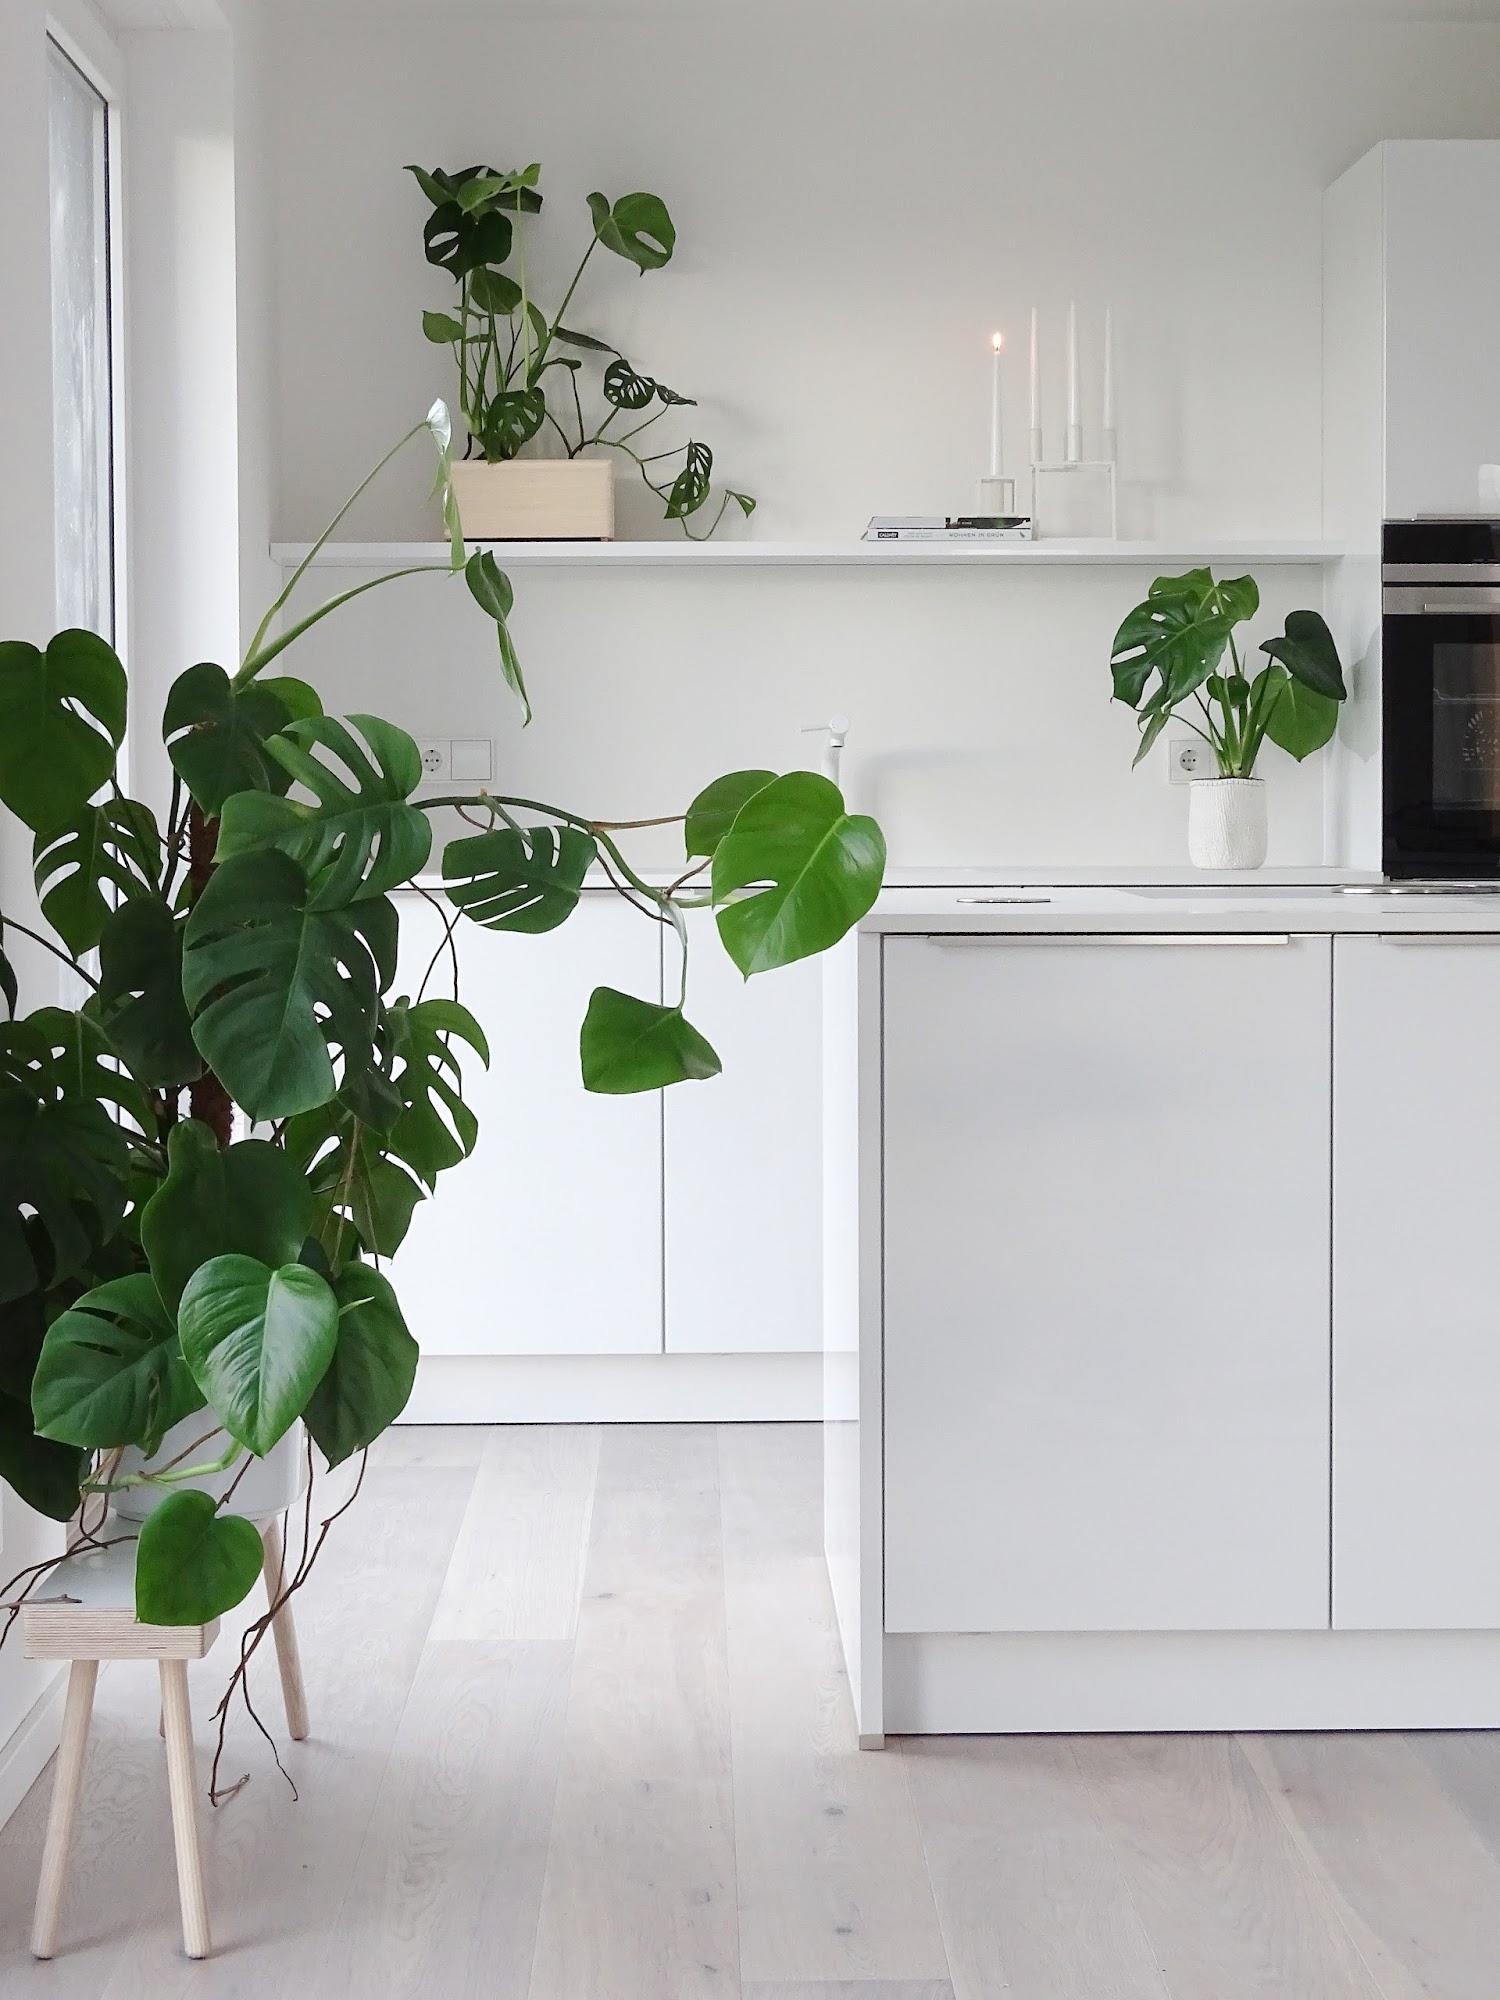 Indoor Garten Anlegen Geeignete Pflanzen: Zuhause